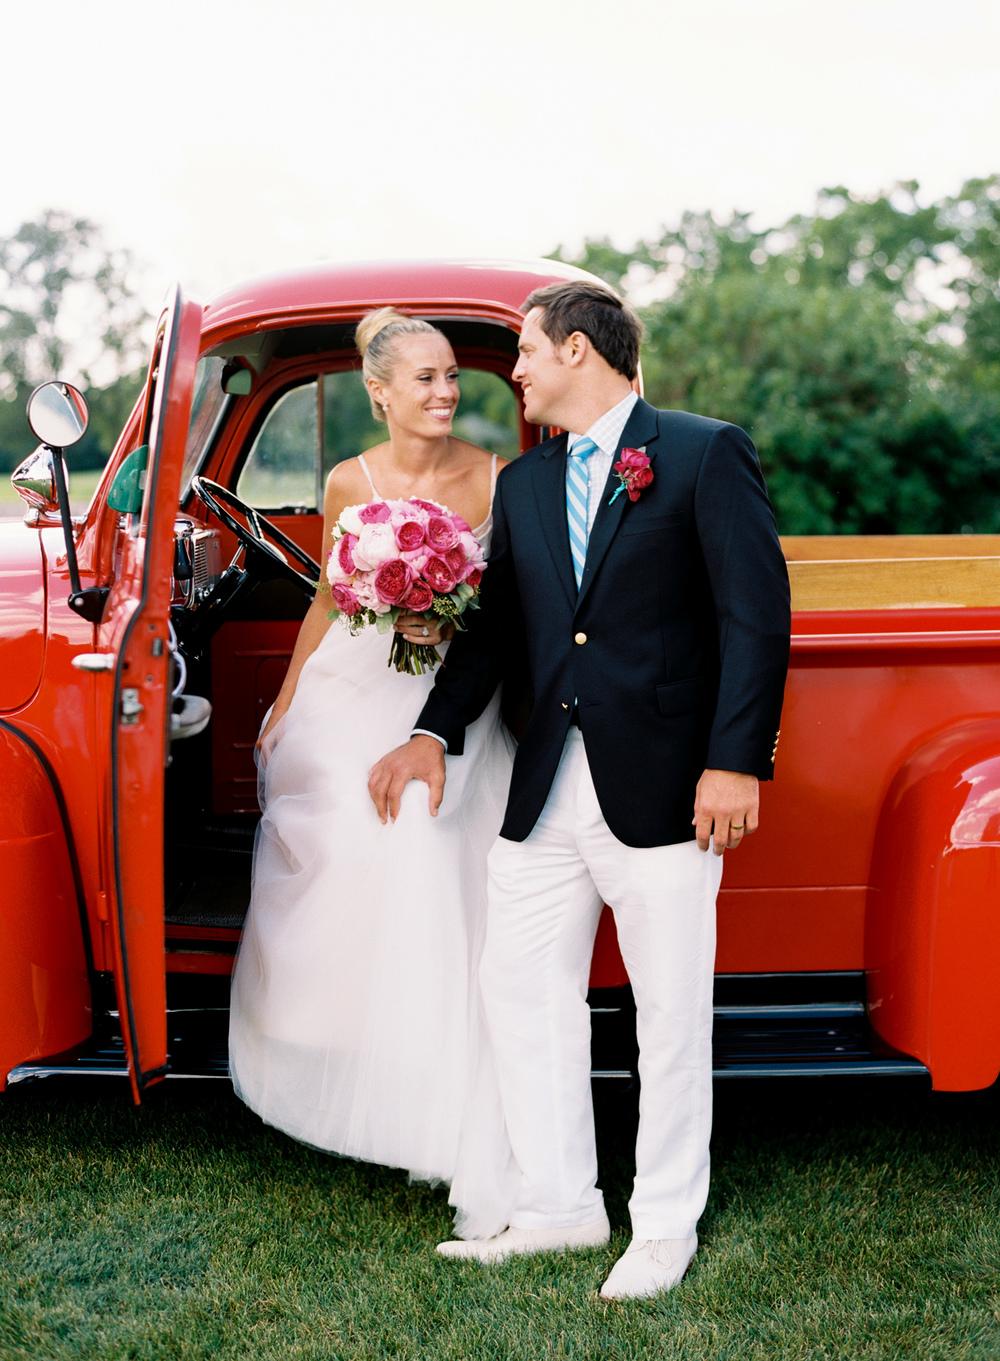 Christian-Kate-Wedding-365.jpg